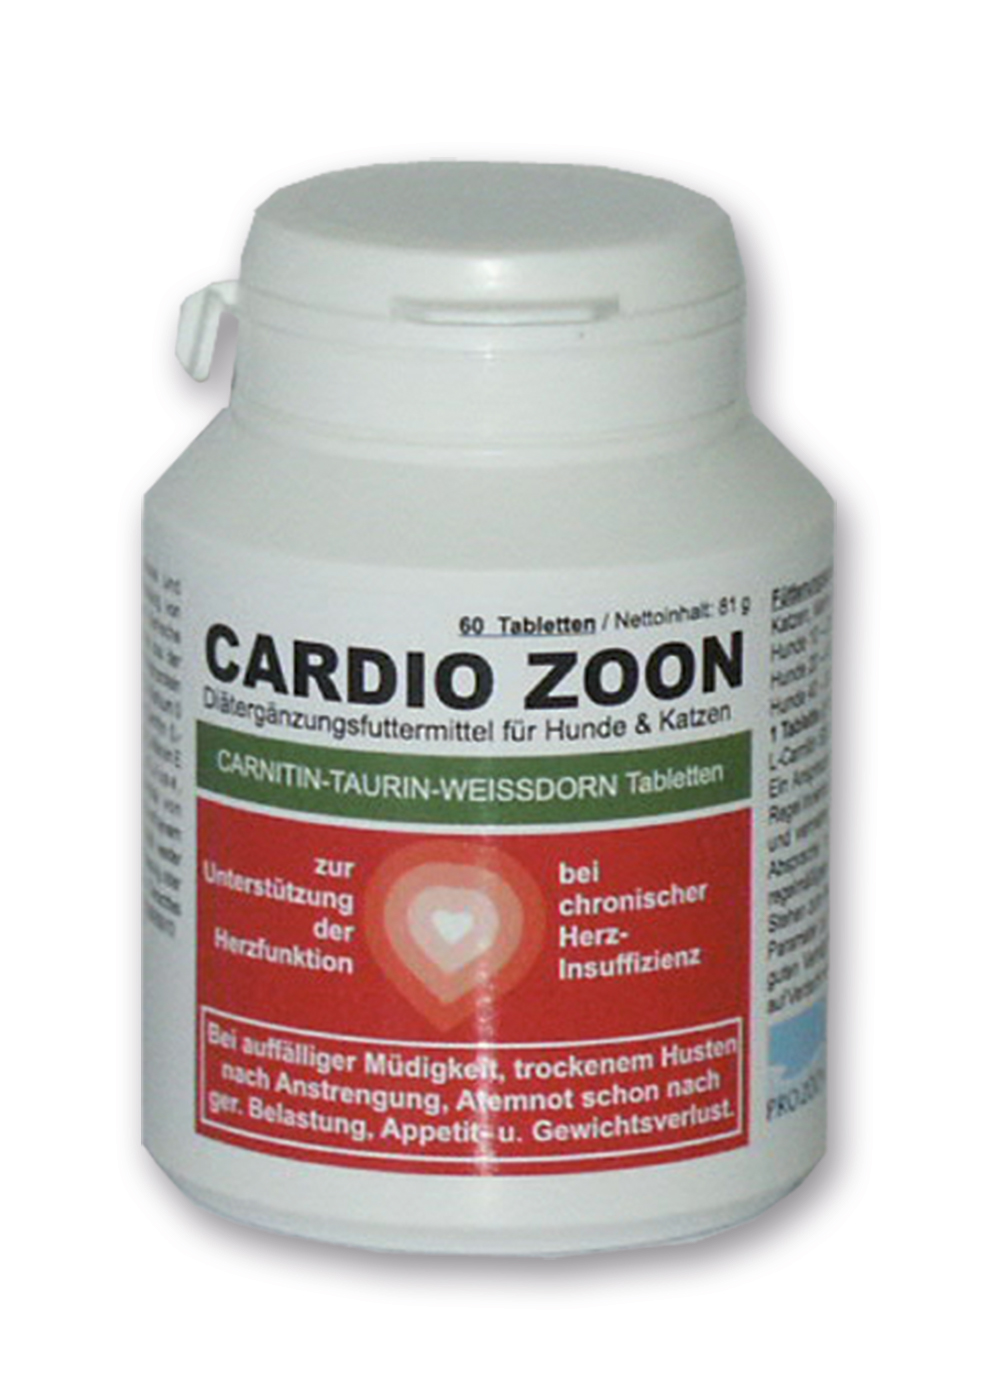 CARDIO ZOON